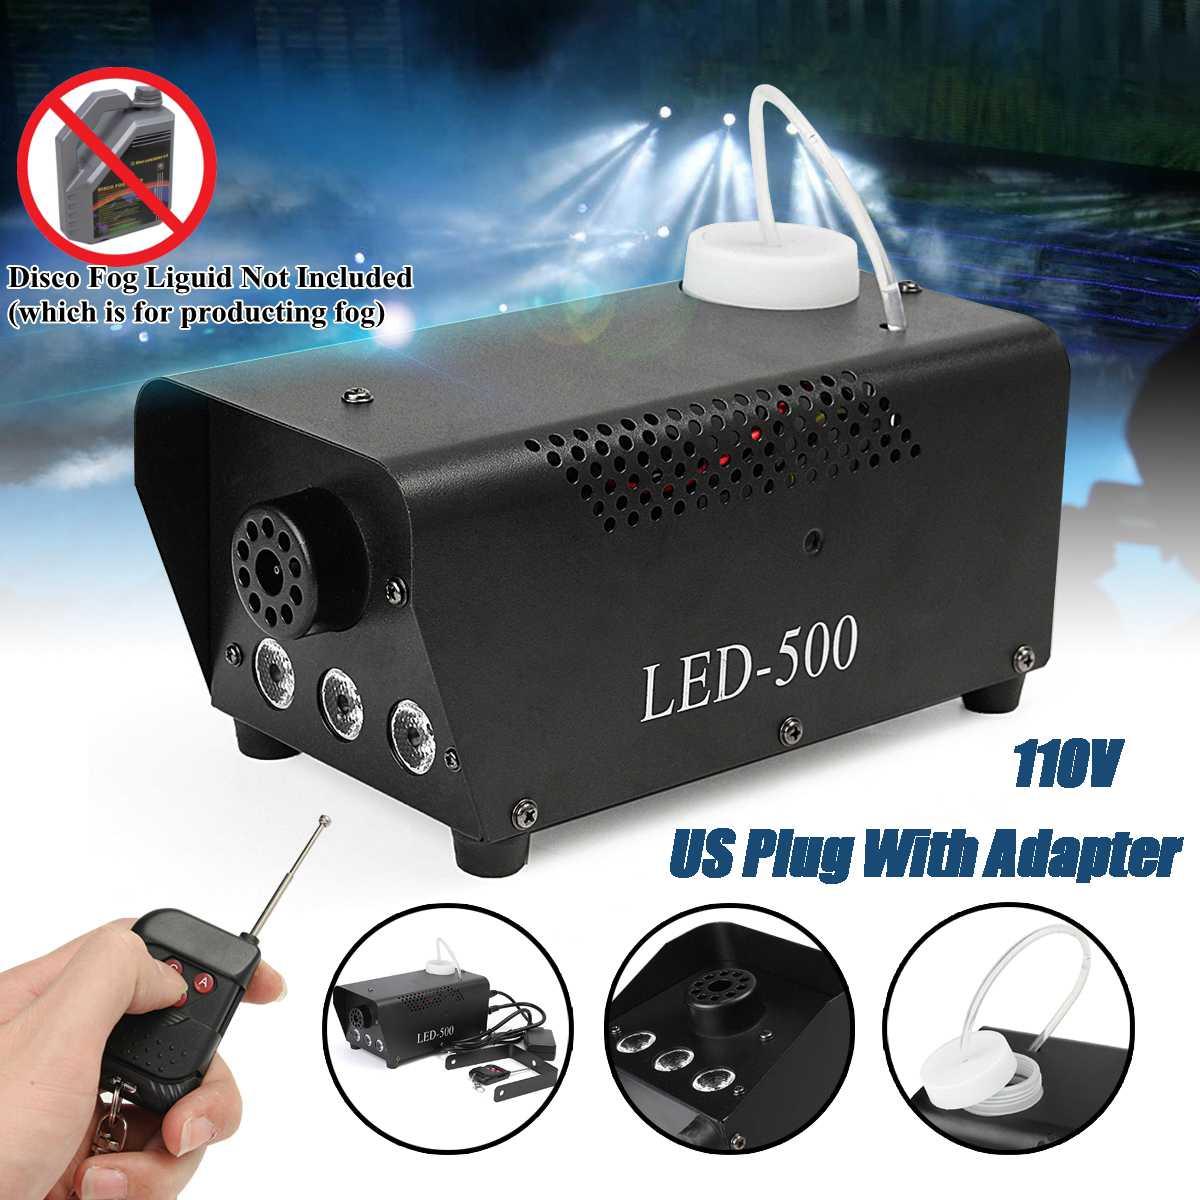 500W humo máquina antiniebla RGB LED remoto DJ discoteca Fiesta Club luz blanca humo Luz